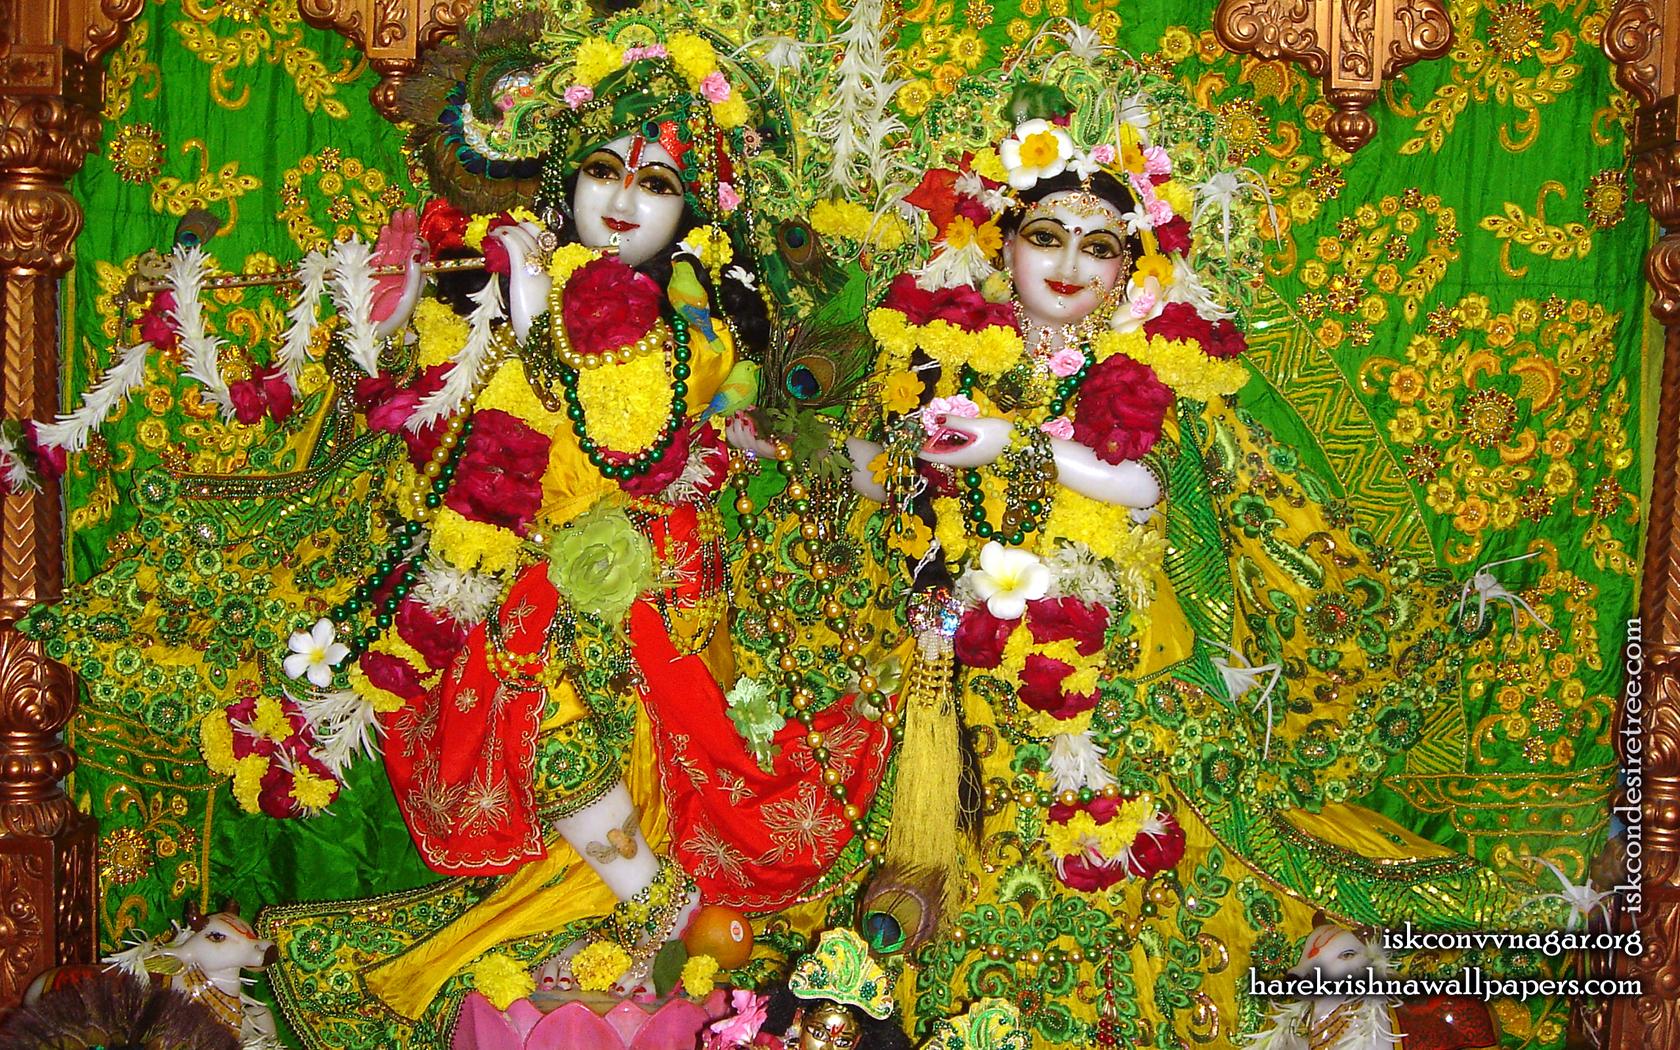 Sri Sri Radha Giridhari Wallpaper (011) Size 1680x1050 Download